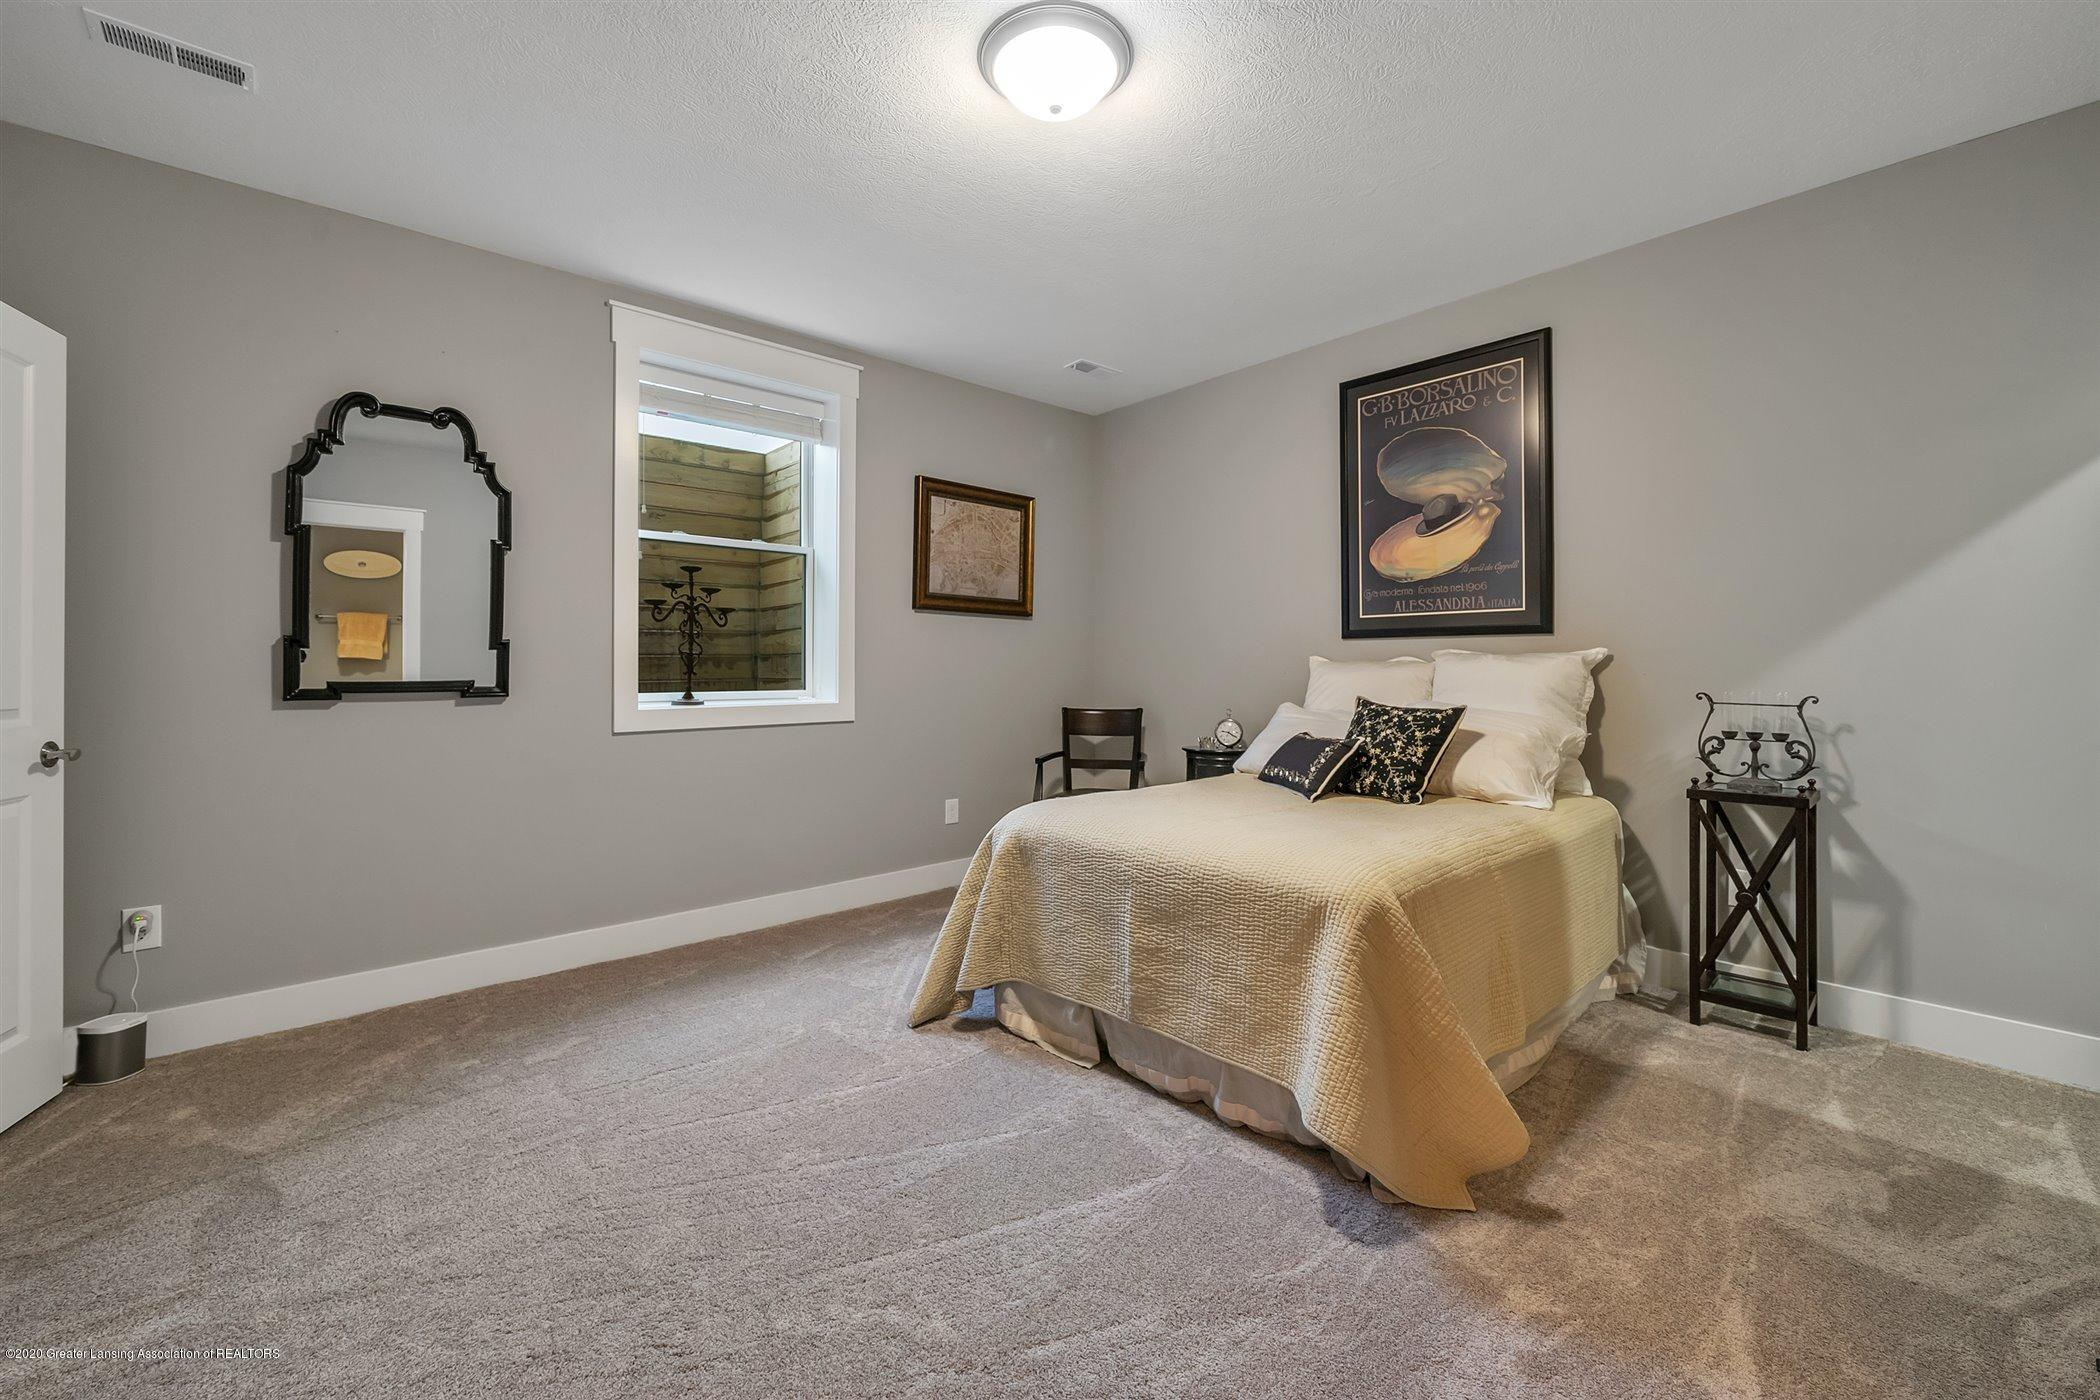 6090 Sleepy Hollow Ln - (35) LOWER LEVEL Bedroom 4 - 36